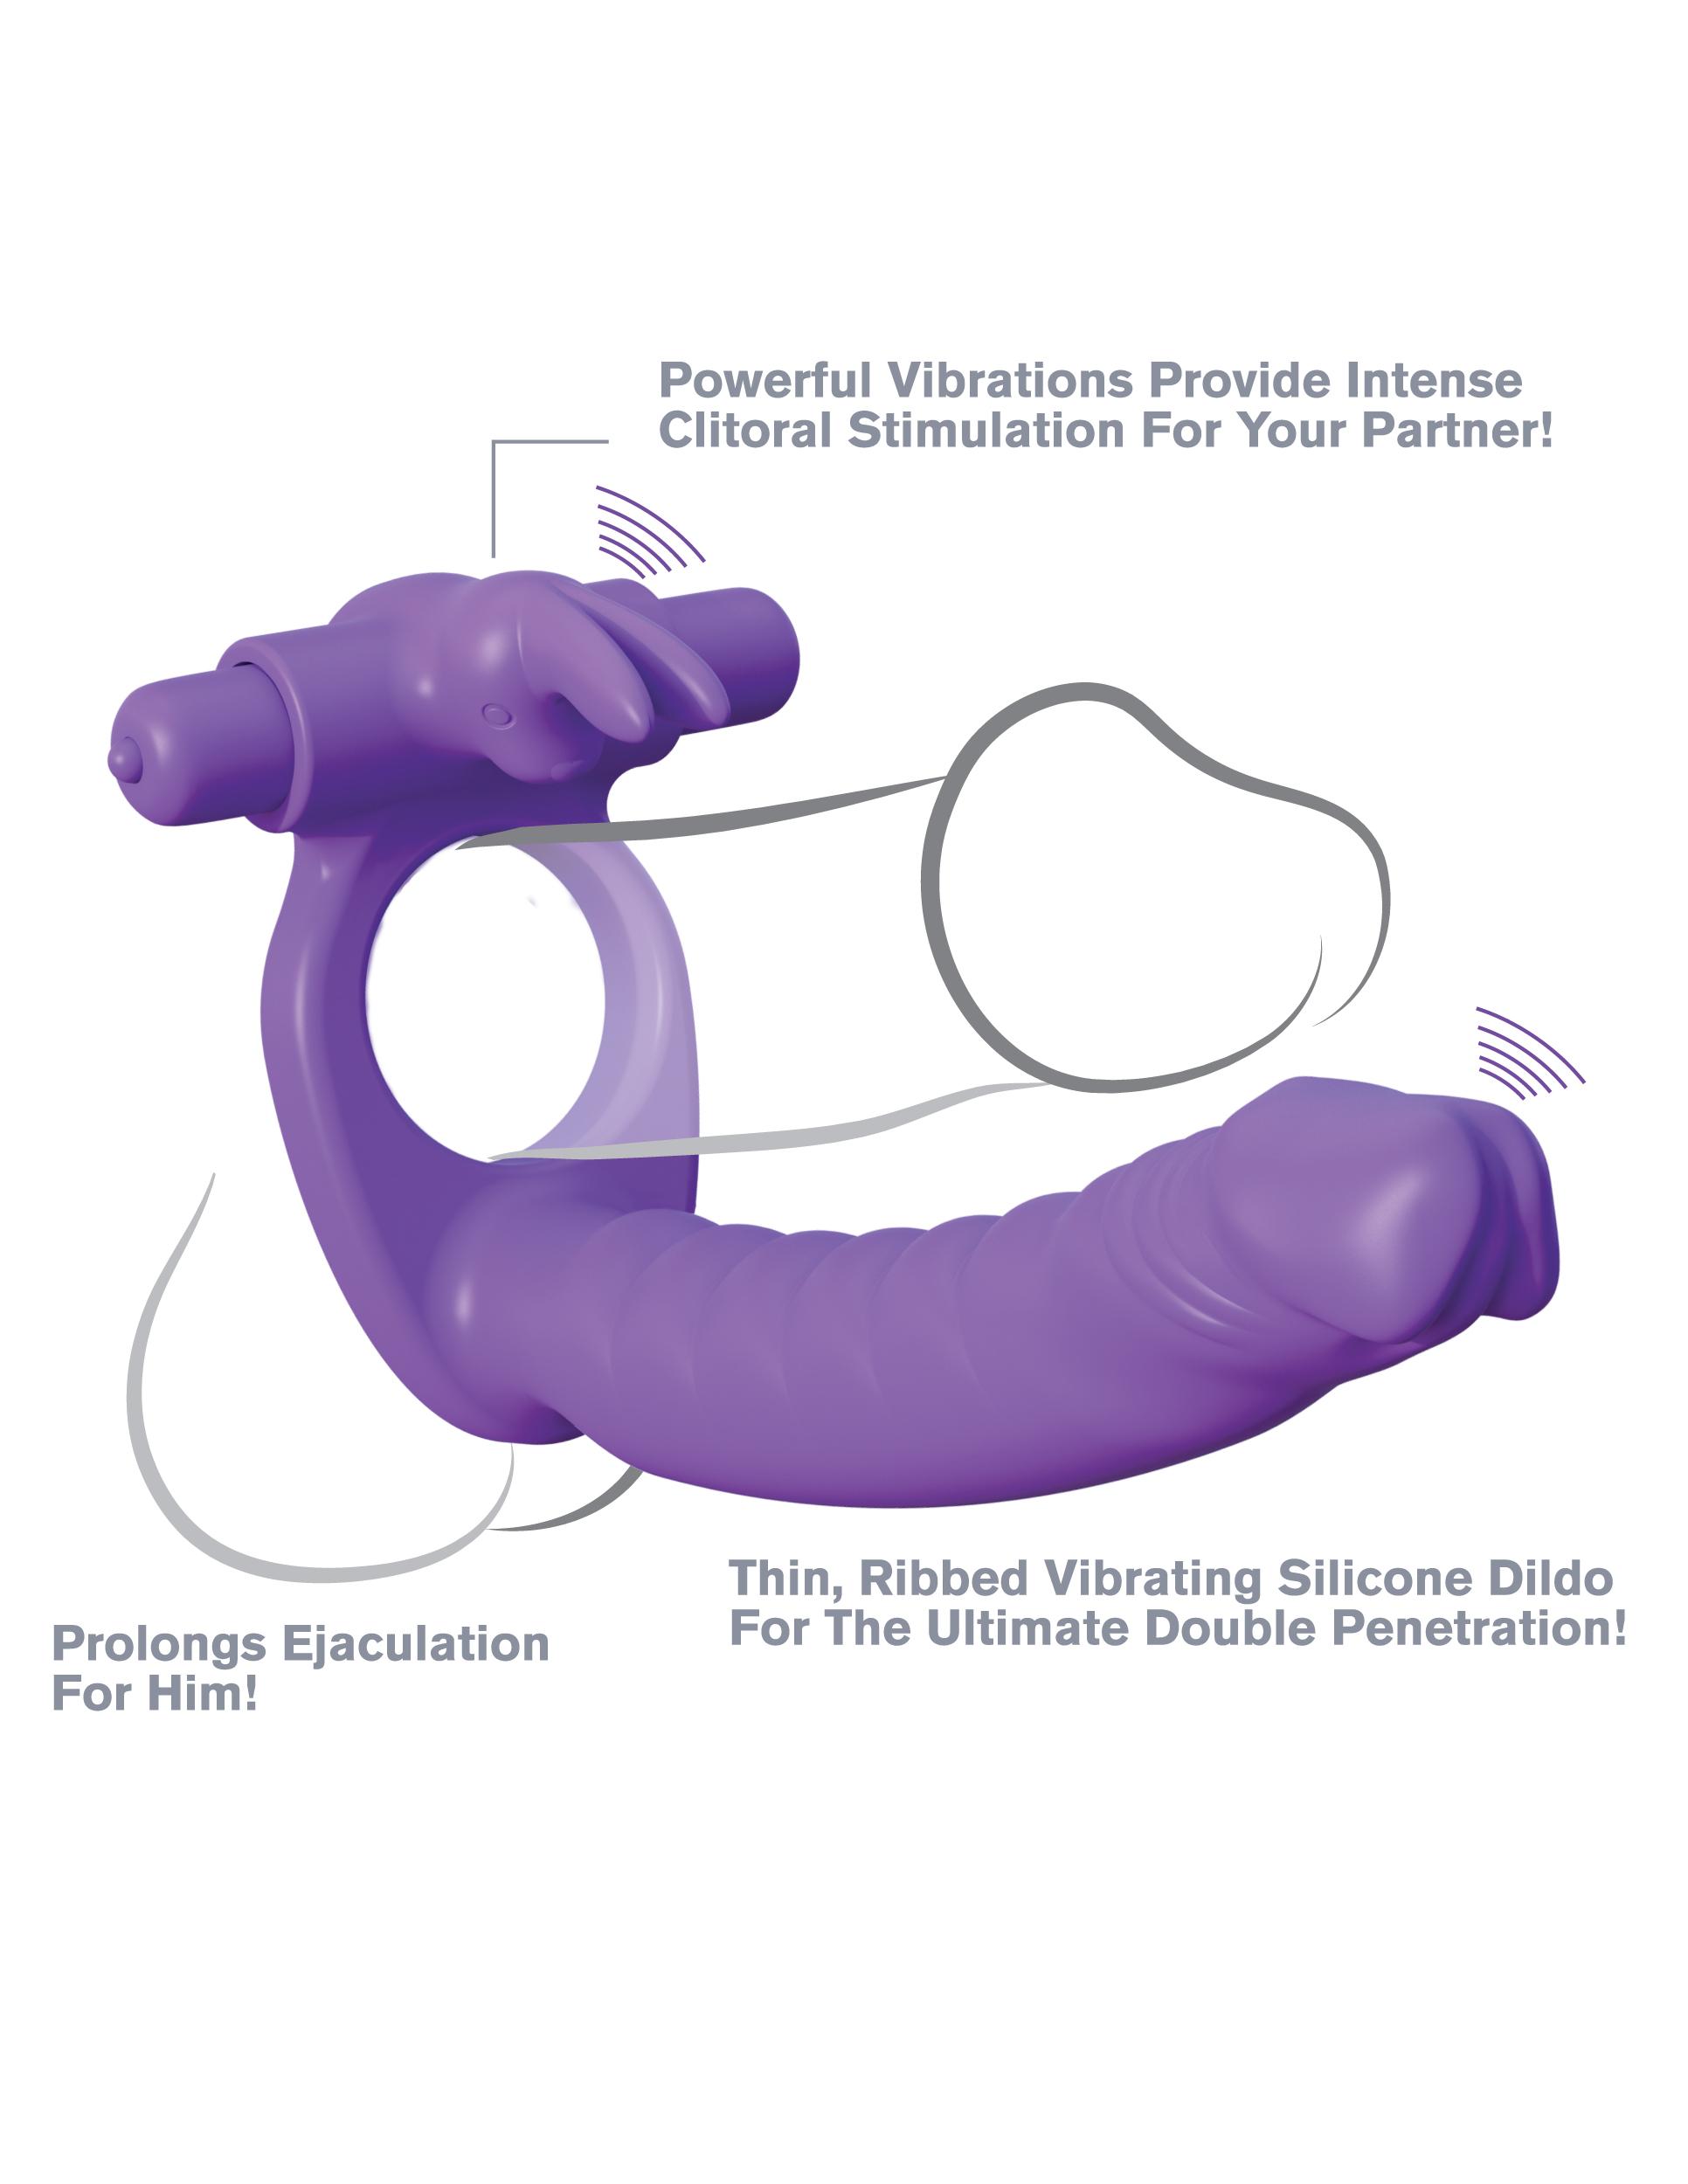 Вибро-кольцо для двойного проникновения Fantasy C-Ringz Silicone Double Penetrator Rabbit